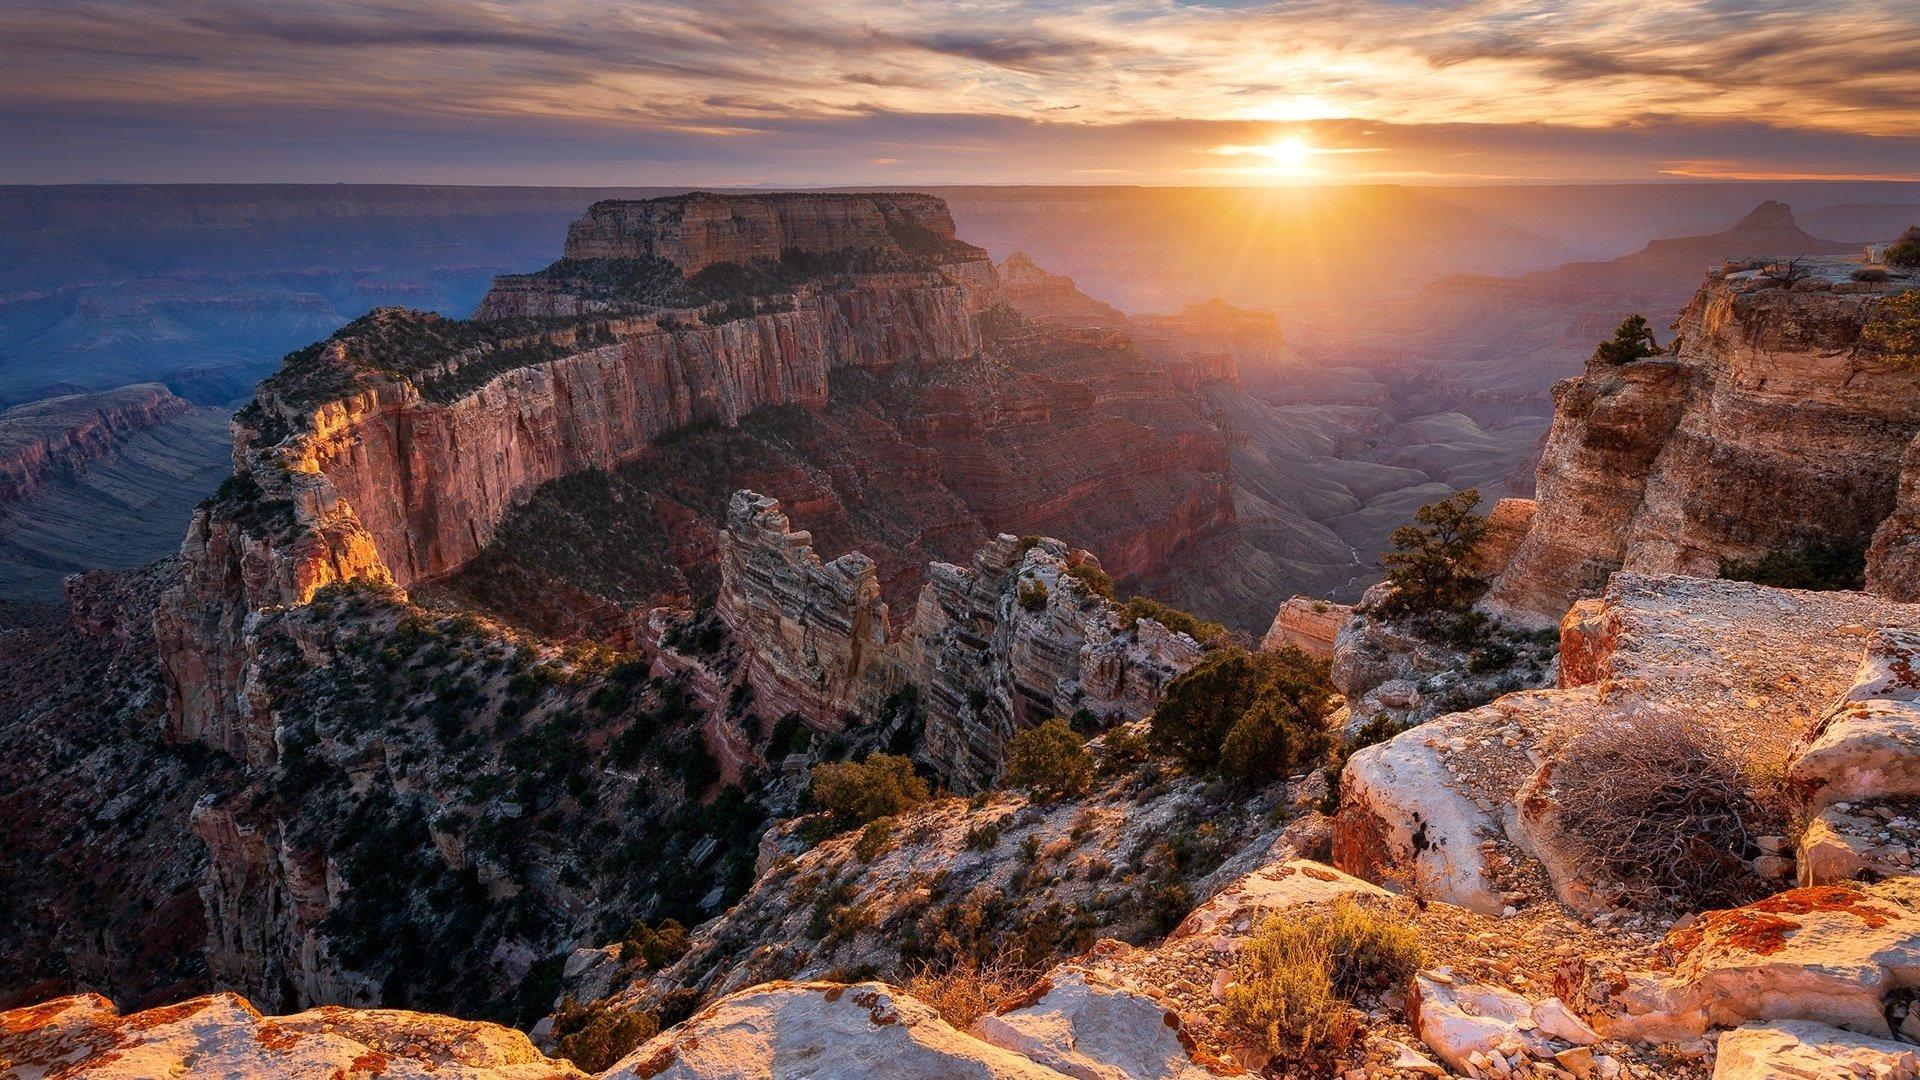 Grand Canyon HD Wallpaper | Background Image | 1920x1080 ...